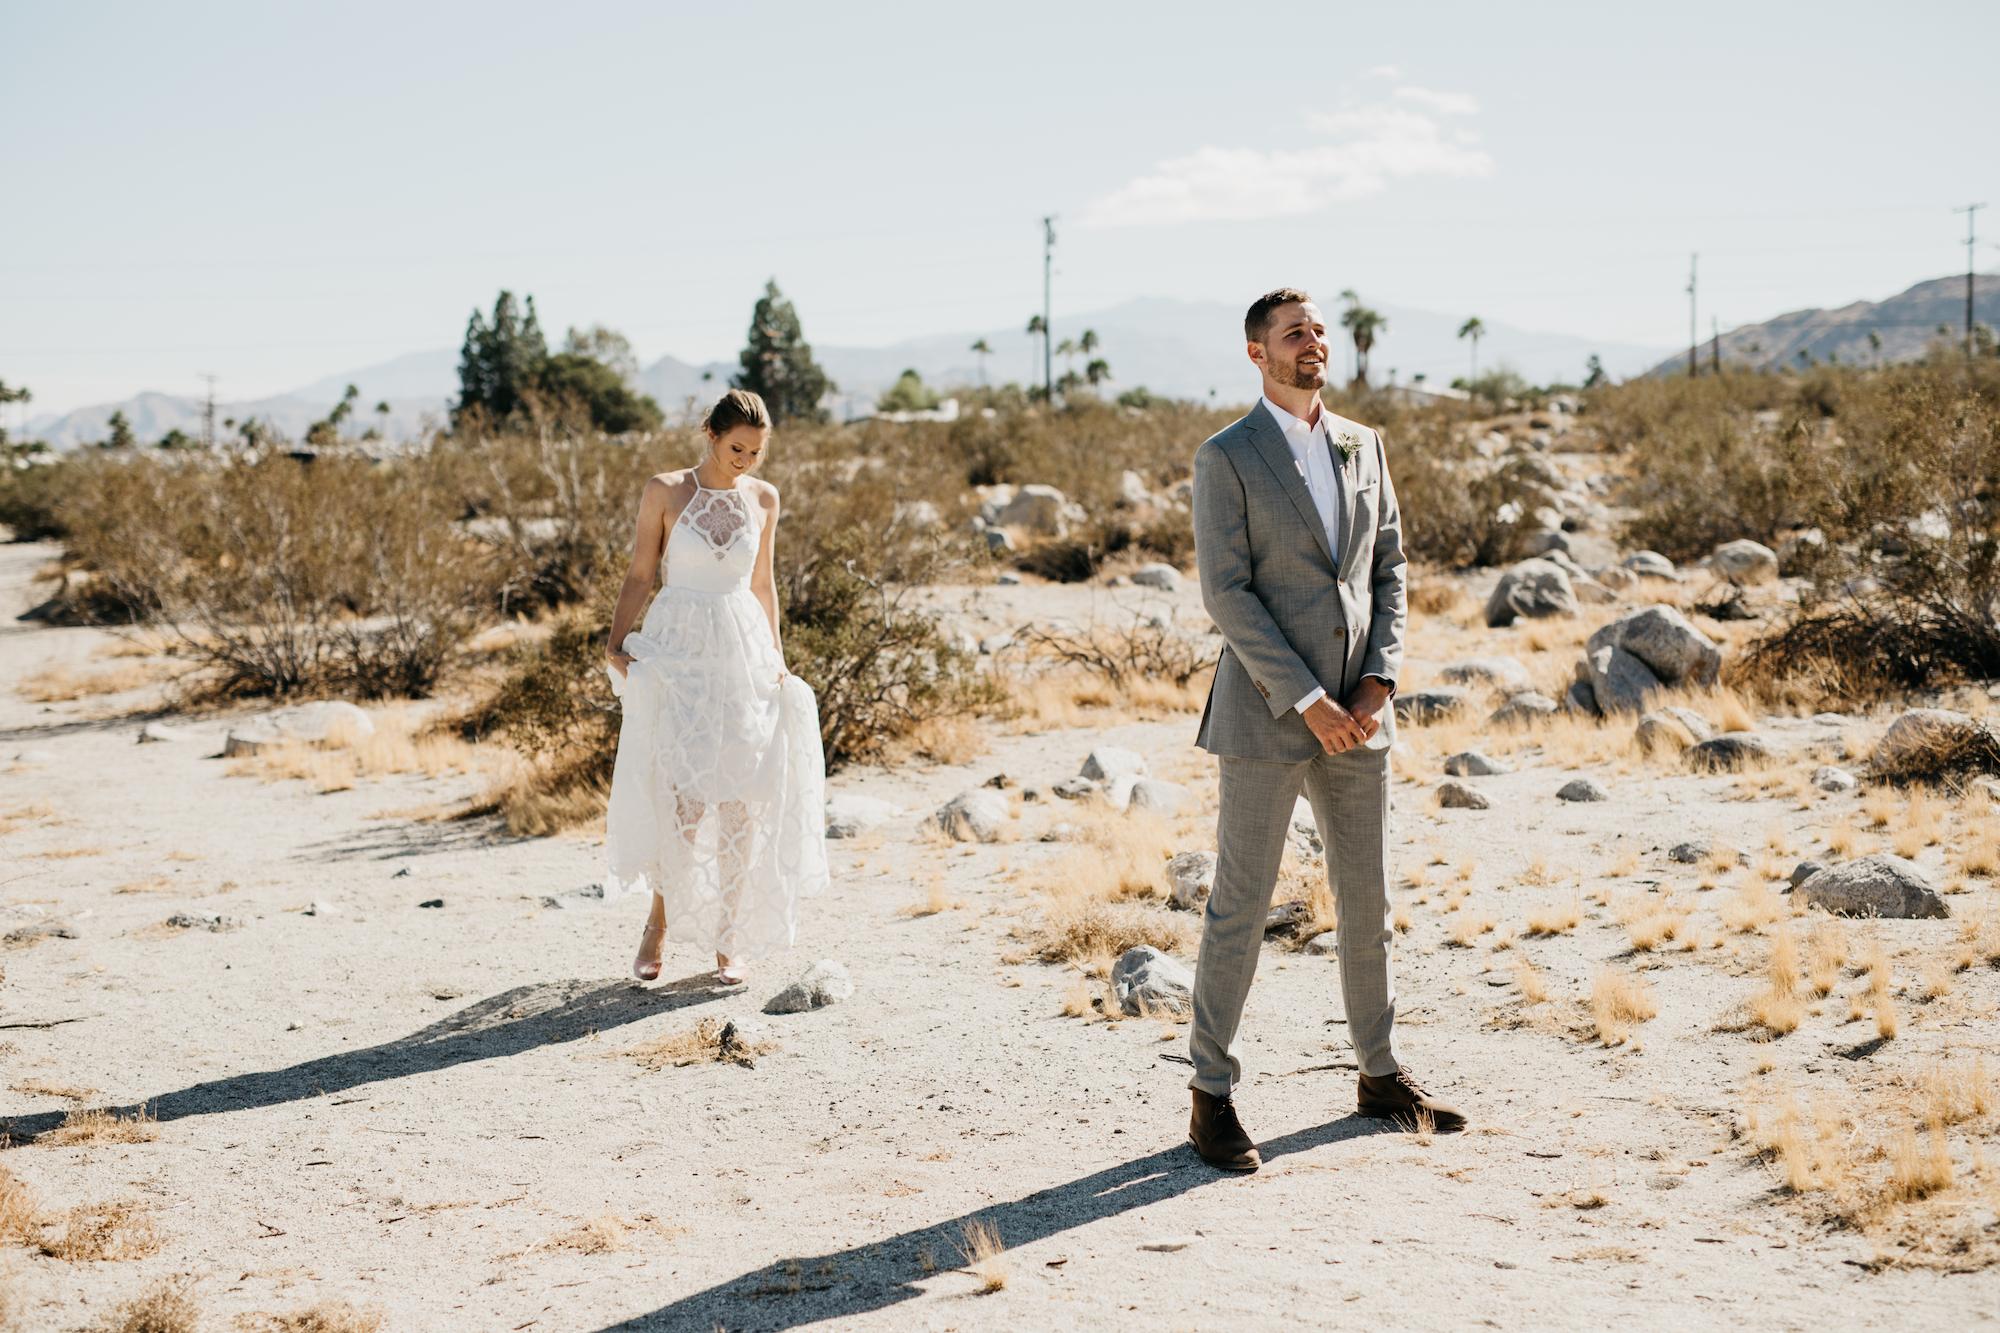 ace-hotel-palm-springs-wedding-photographer194.jpg